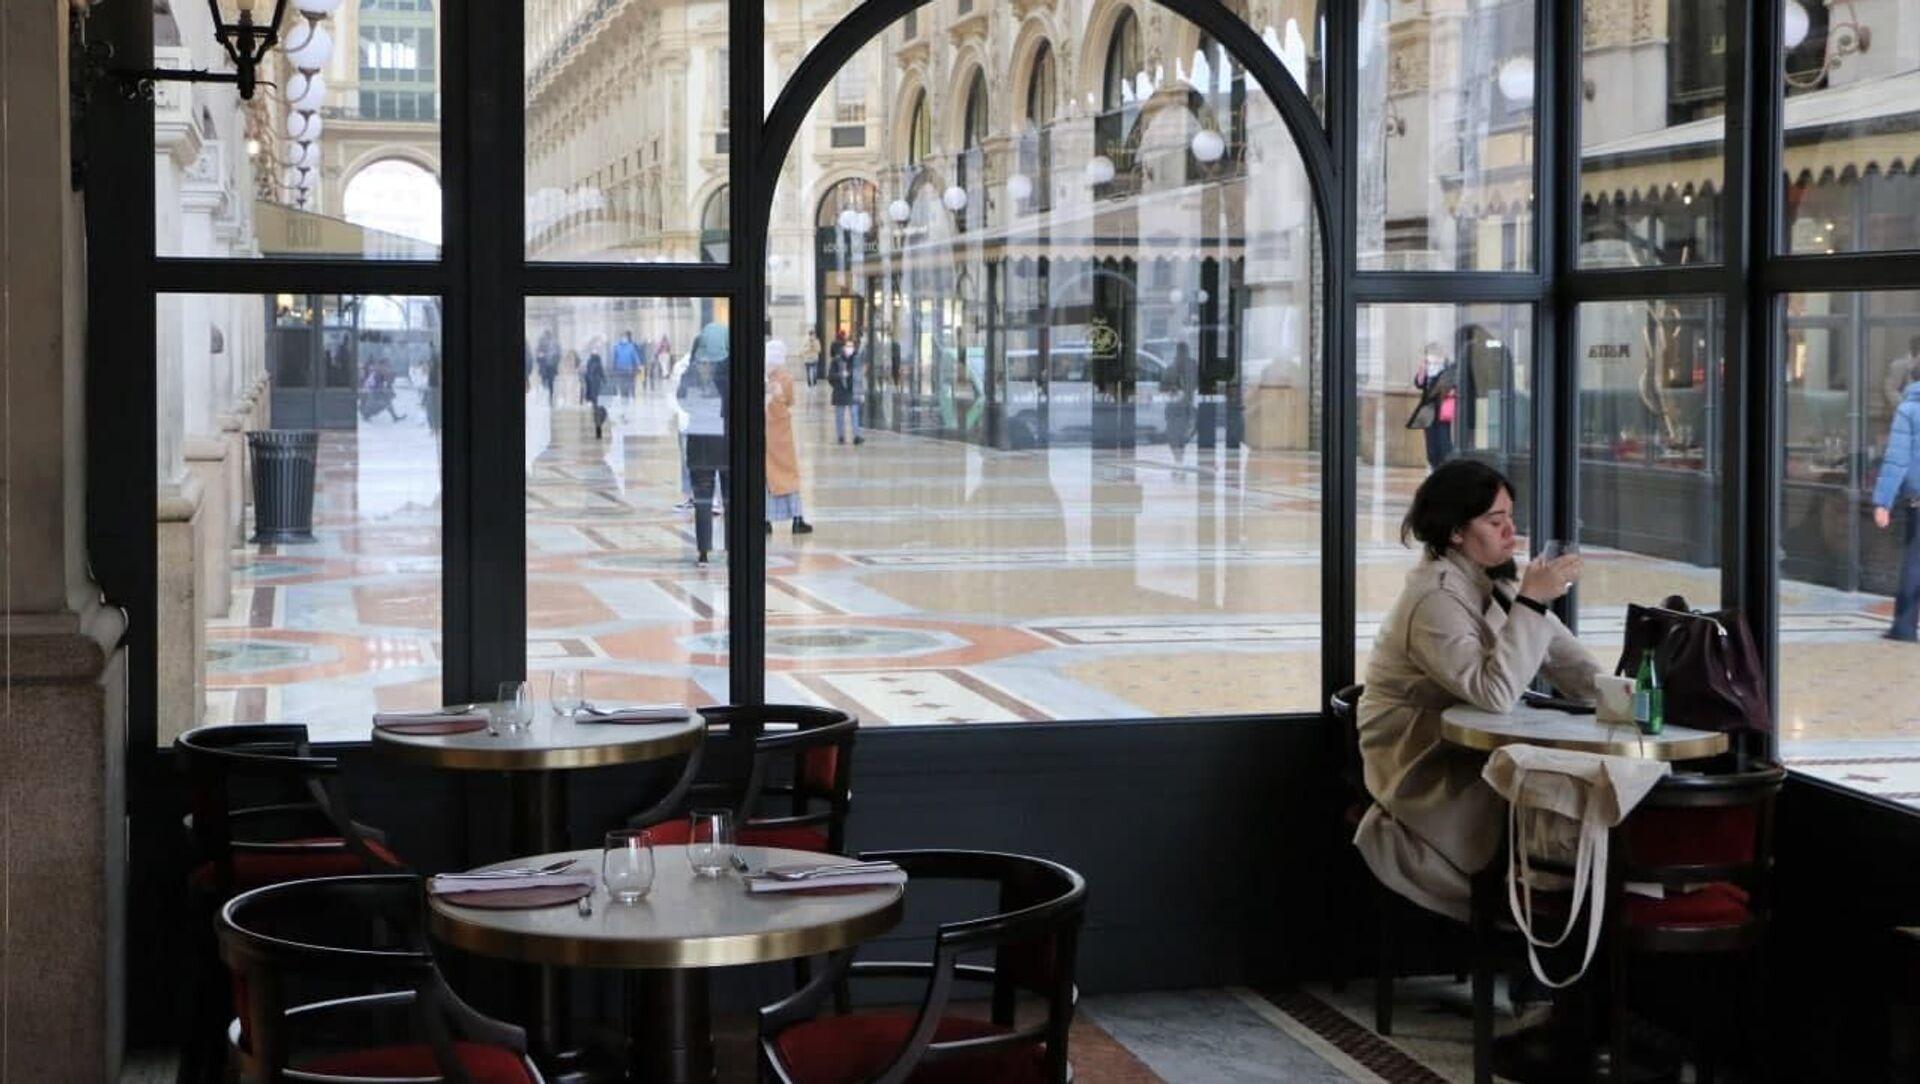 Un bar a Milano, Italia - Sputnik Italia, 1920, 11.04.2021